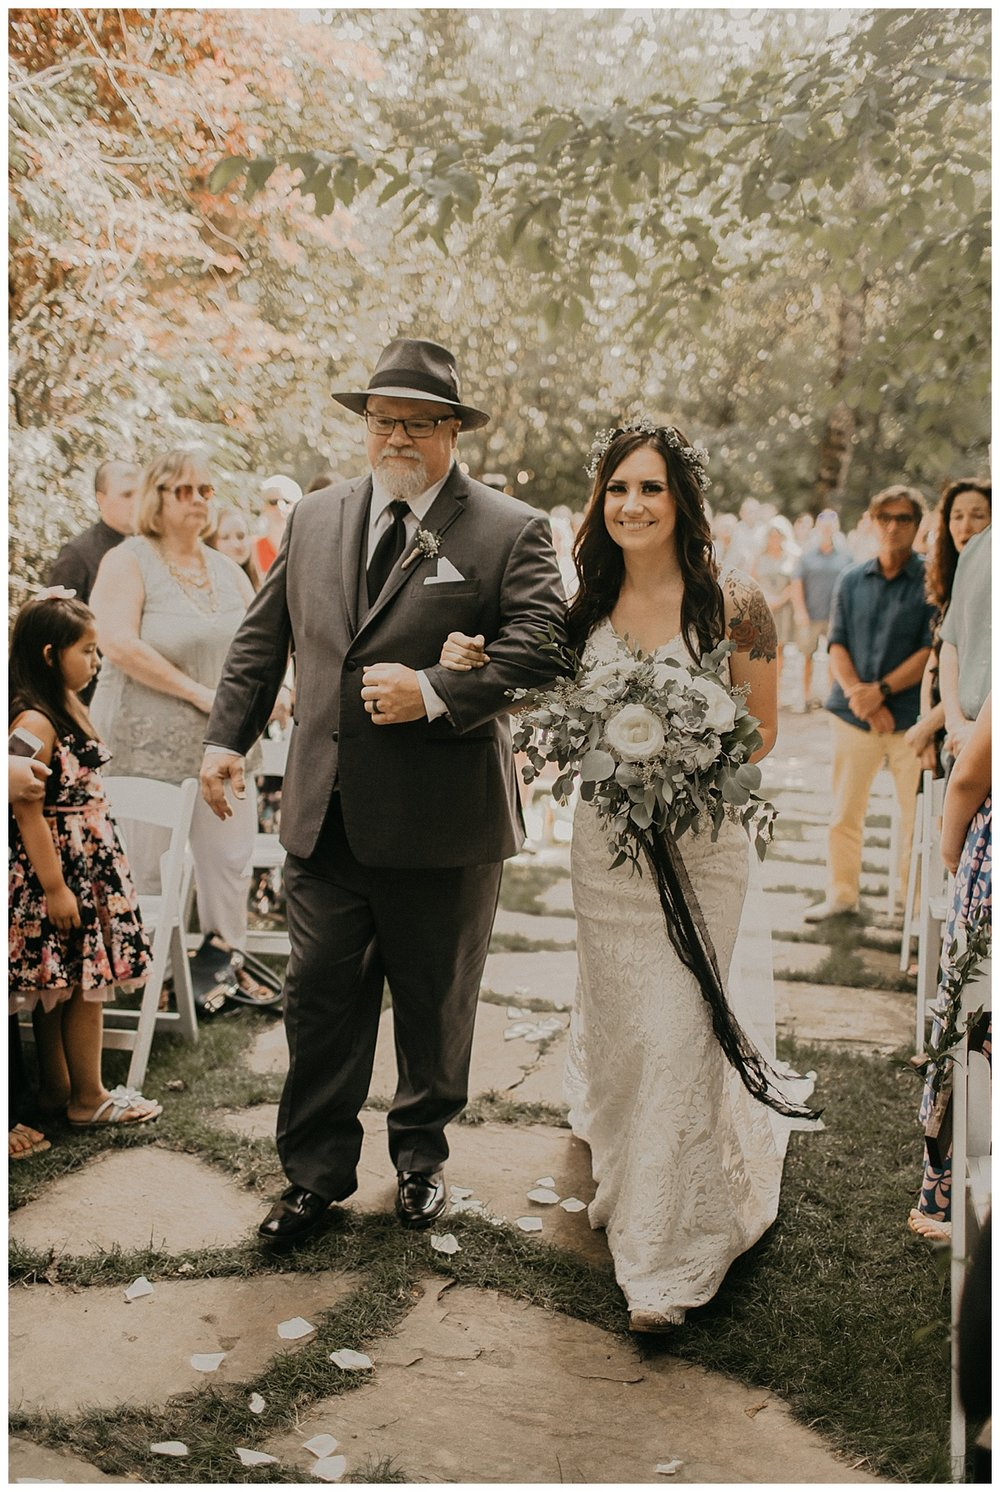 Samantha-McFarlen-PNW-Wedding-Photographer-Maroni-Meadows_1956.jpg